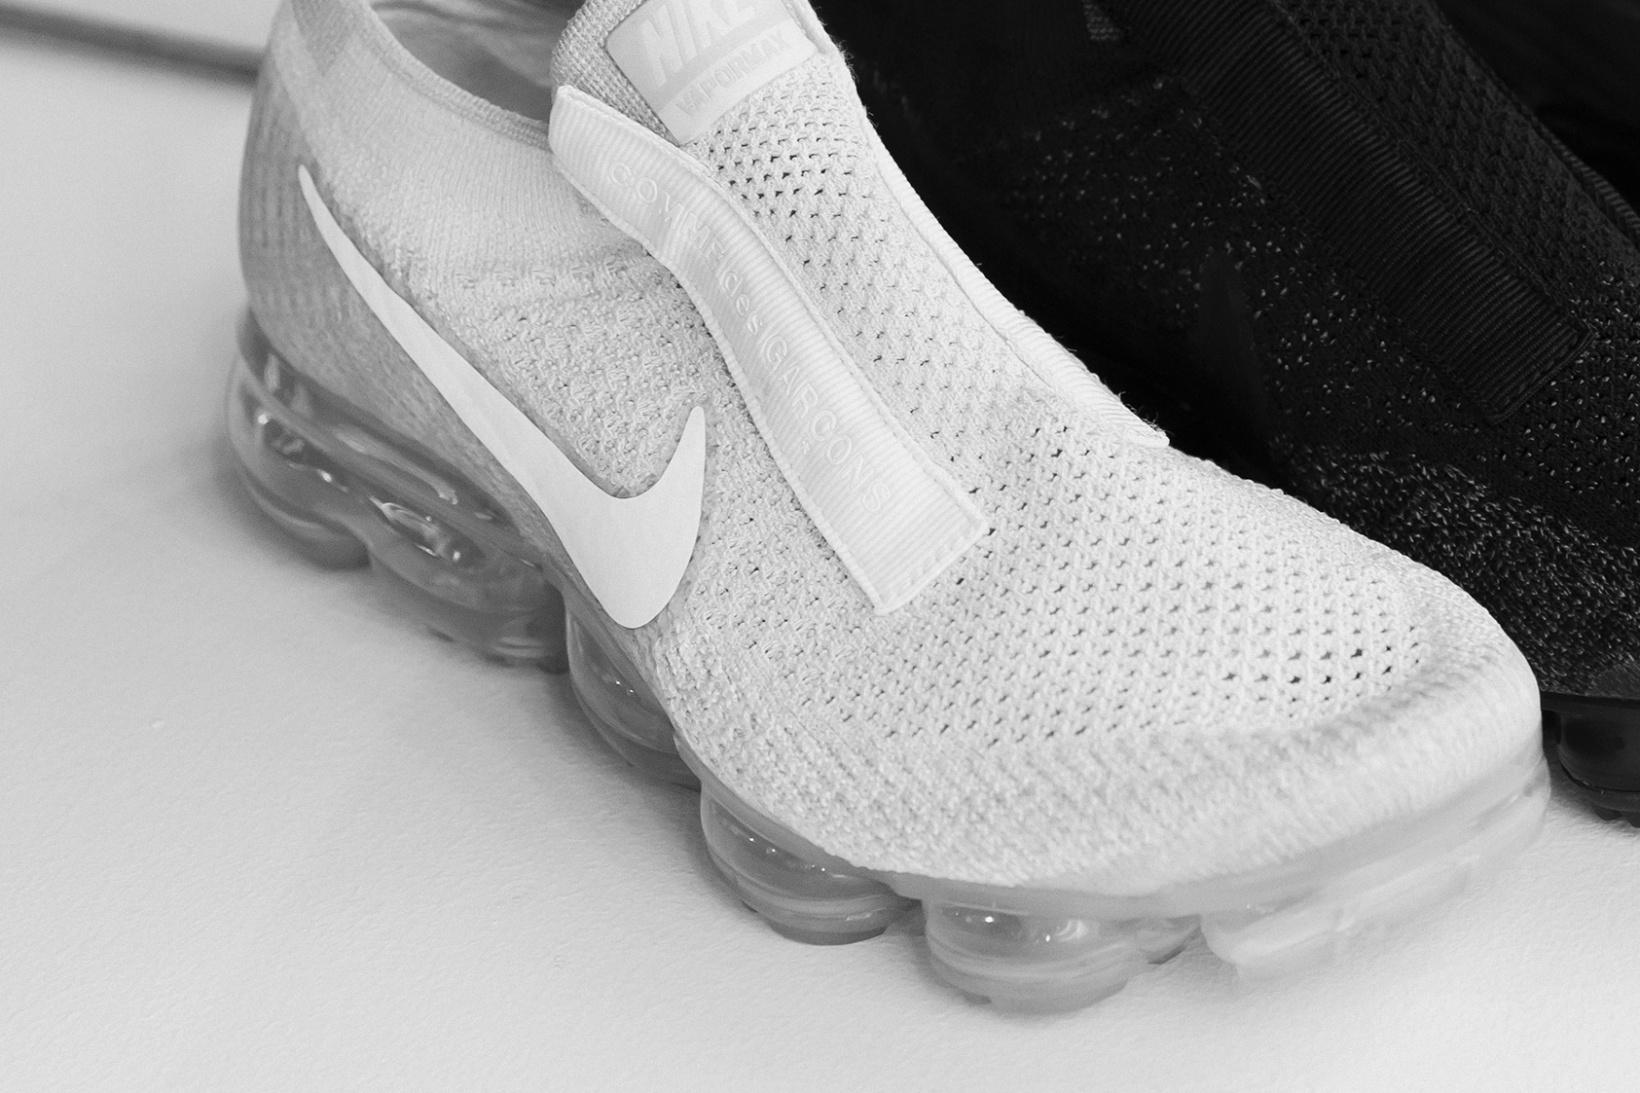 COMME des GARÇONS x NikeLab Vapormax